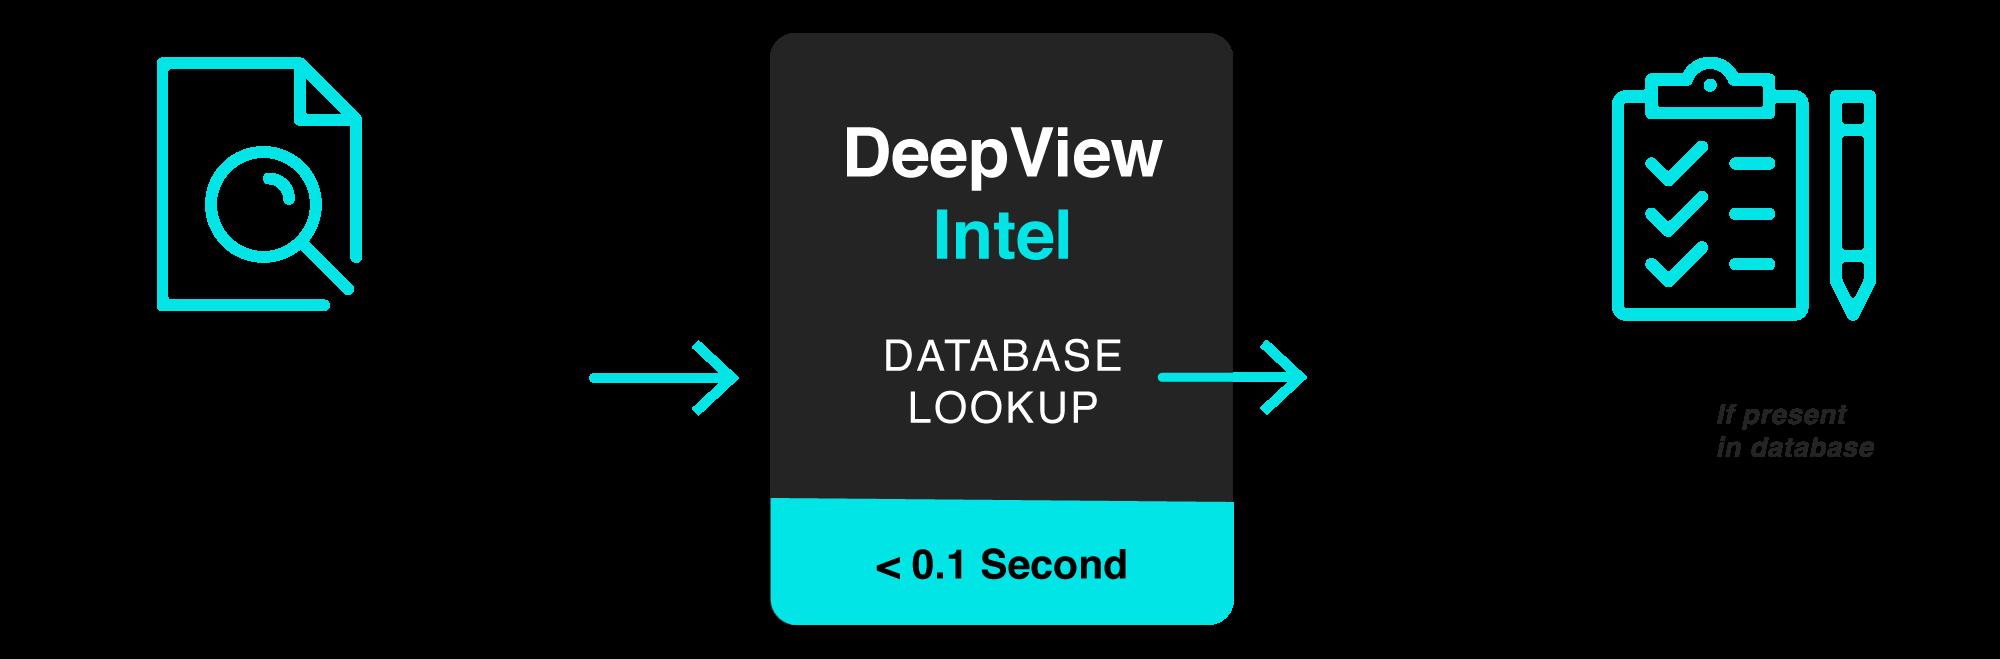 SecondWrite DeepView Intel